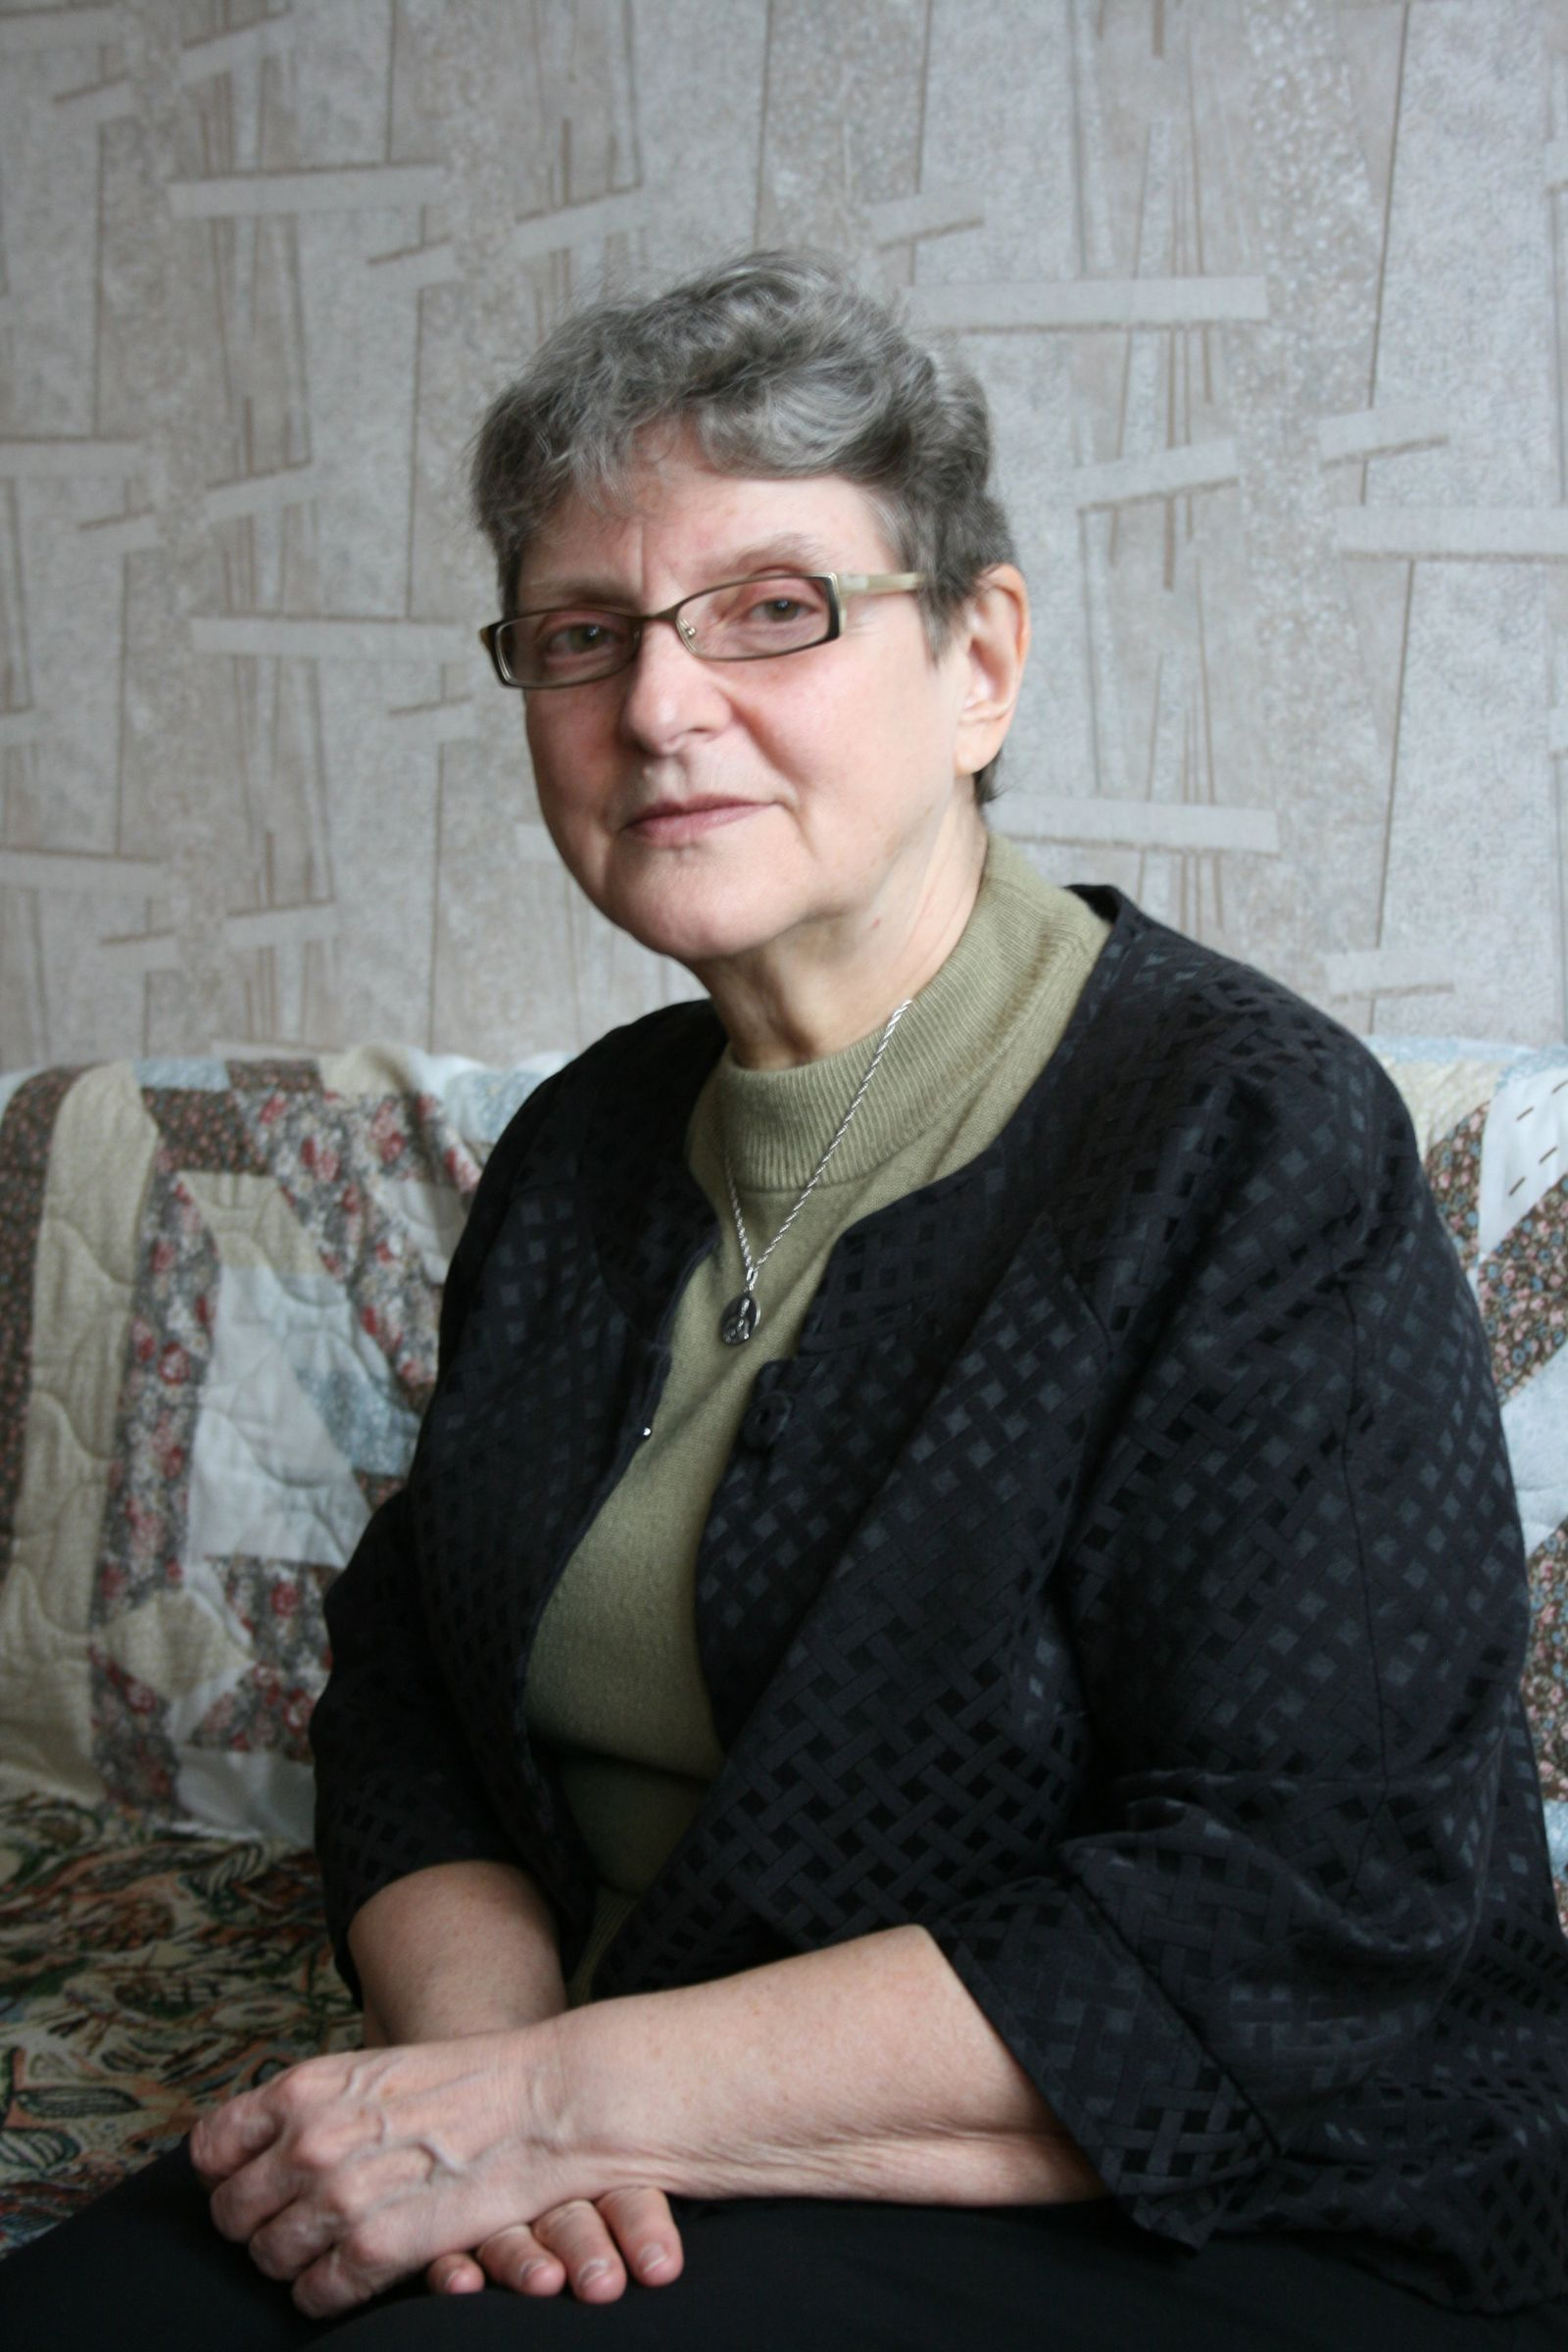 Friedensnobelpreis / Swetlana Gannuschkina